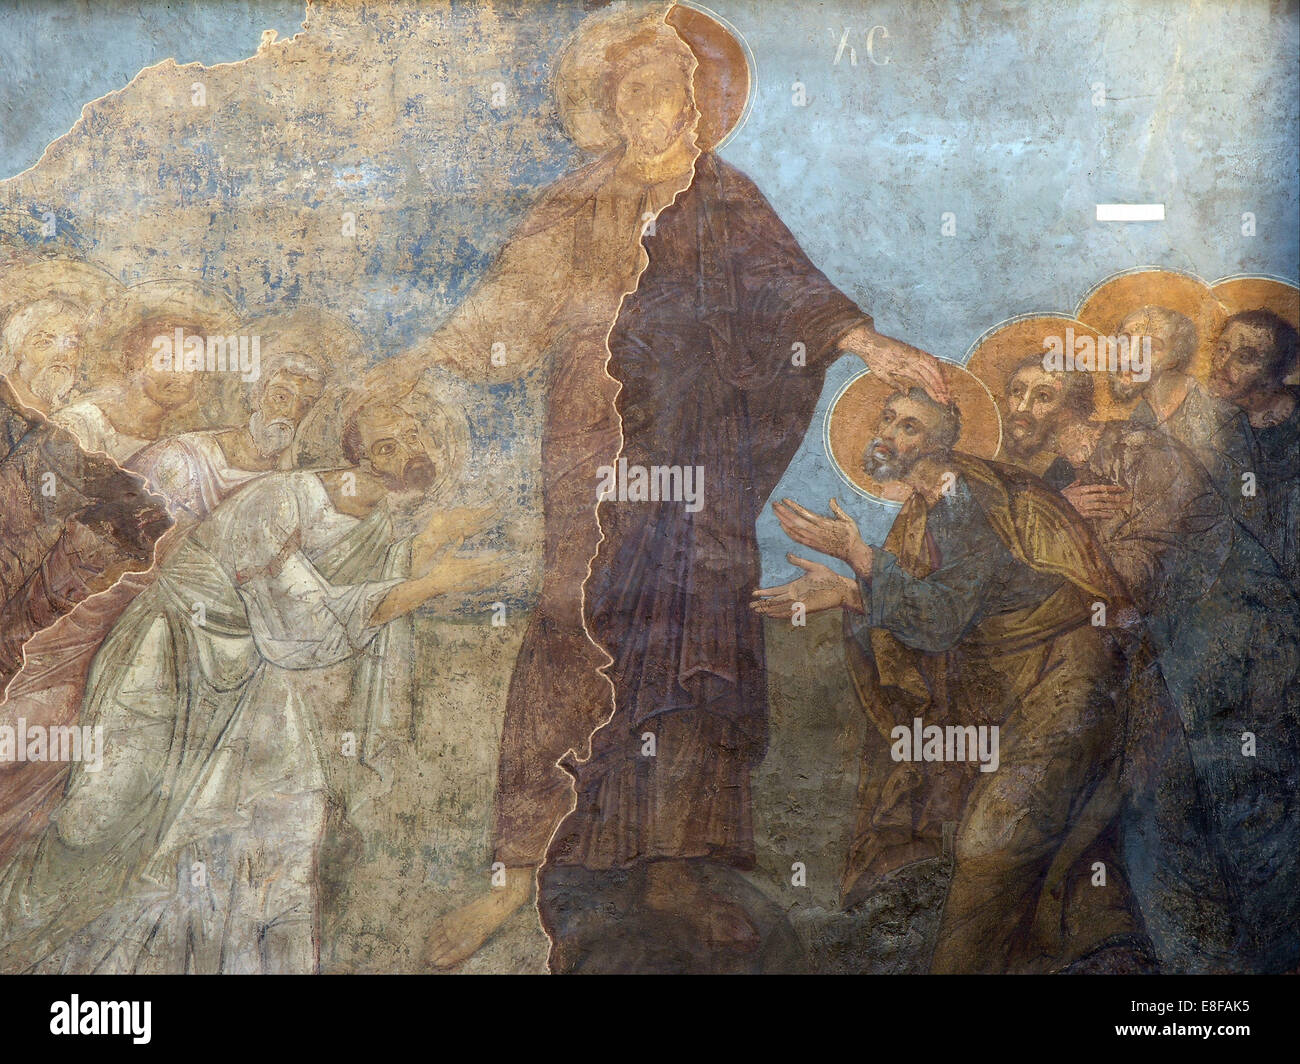 La Pentecoste. Artista: antichi affreschi russo Immagini Stock